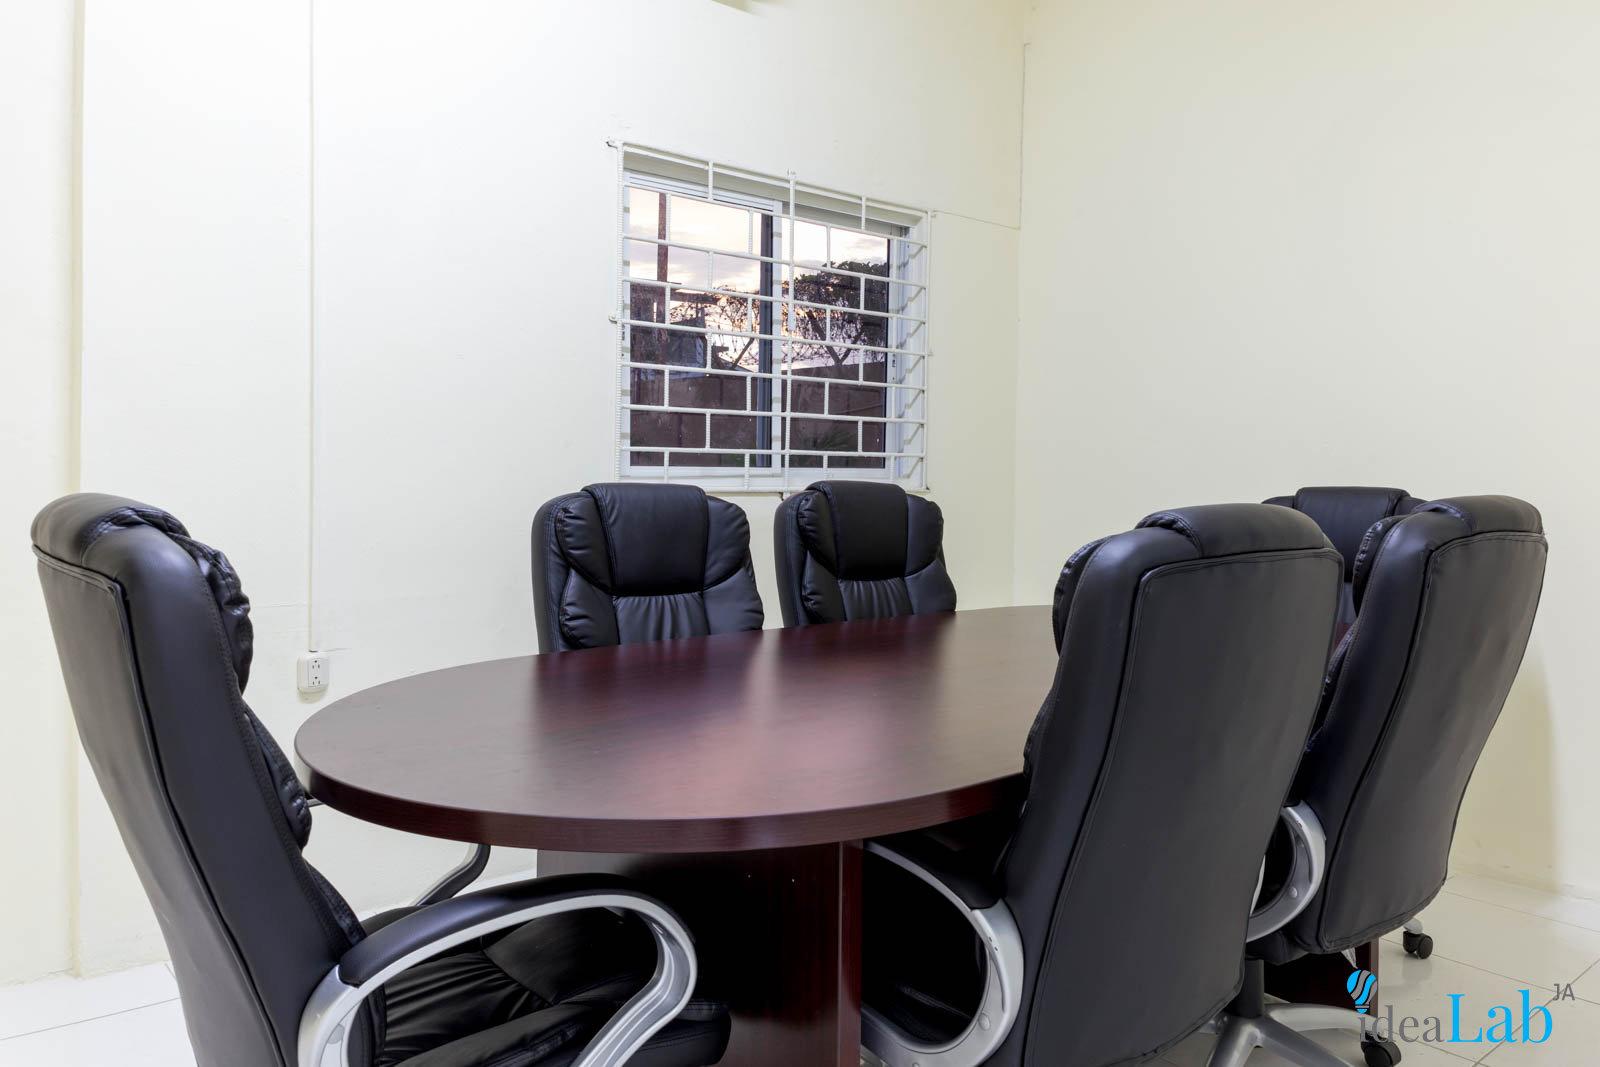 Meeting Room 2 (1 hour)